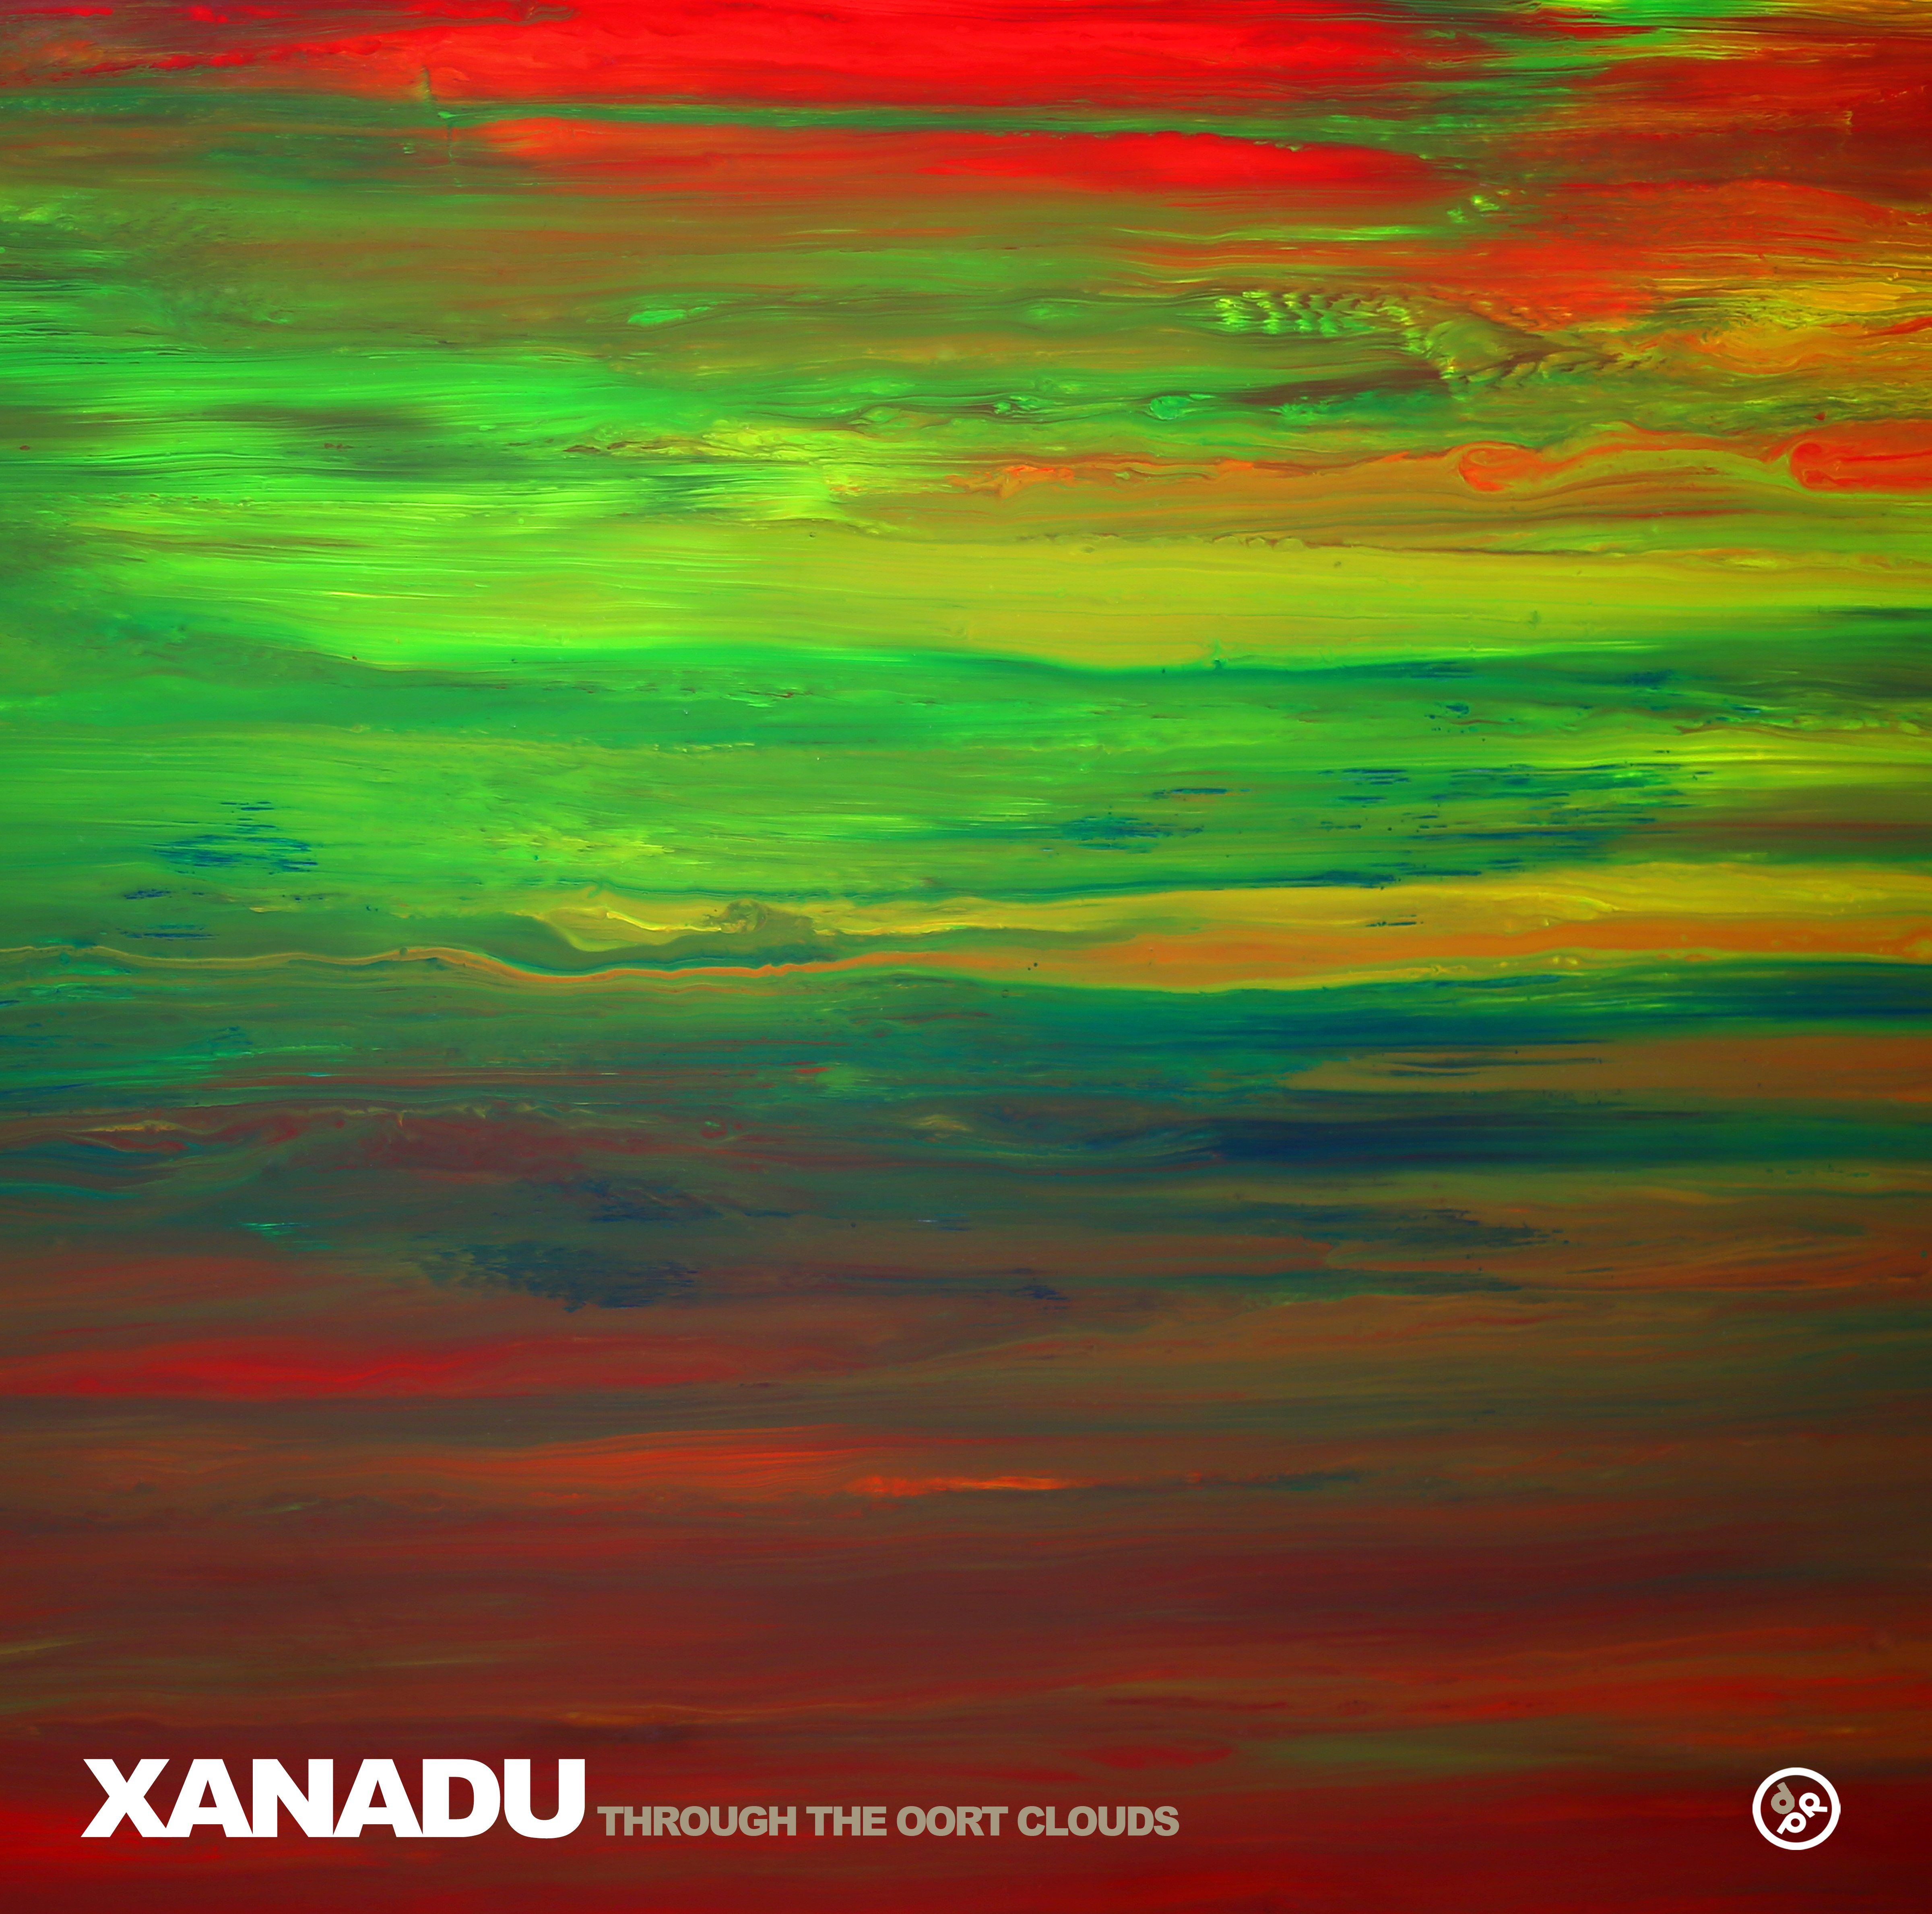 Xanadu/THROUGH THE OORT CLOUDS DLP